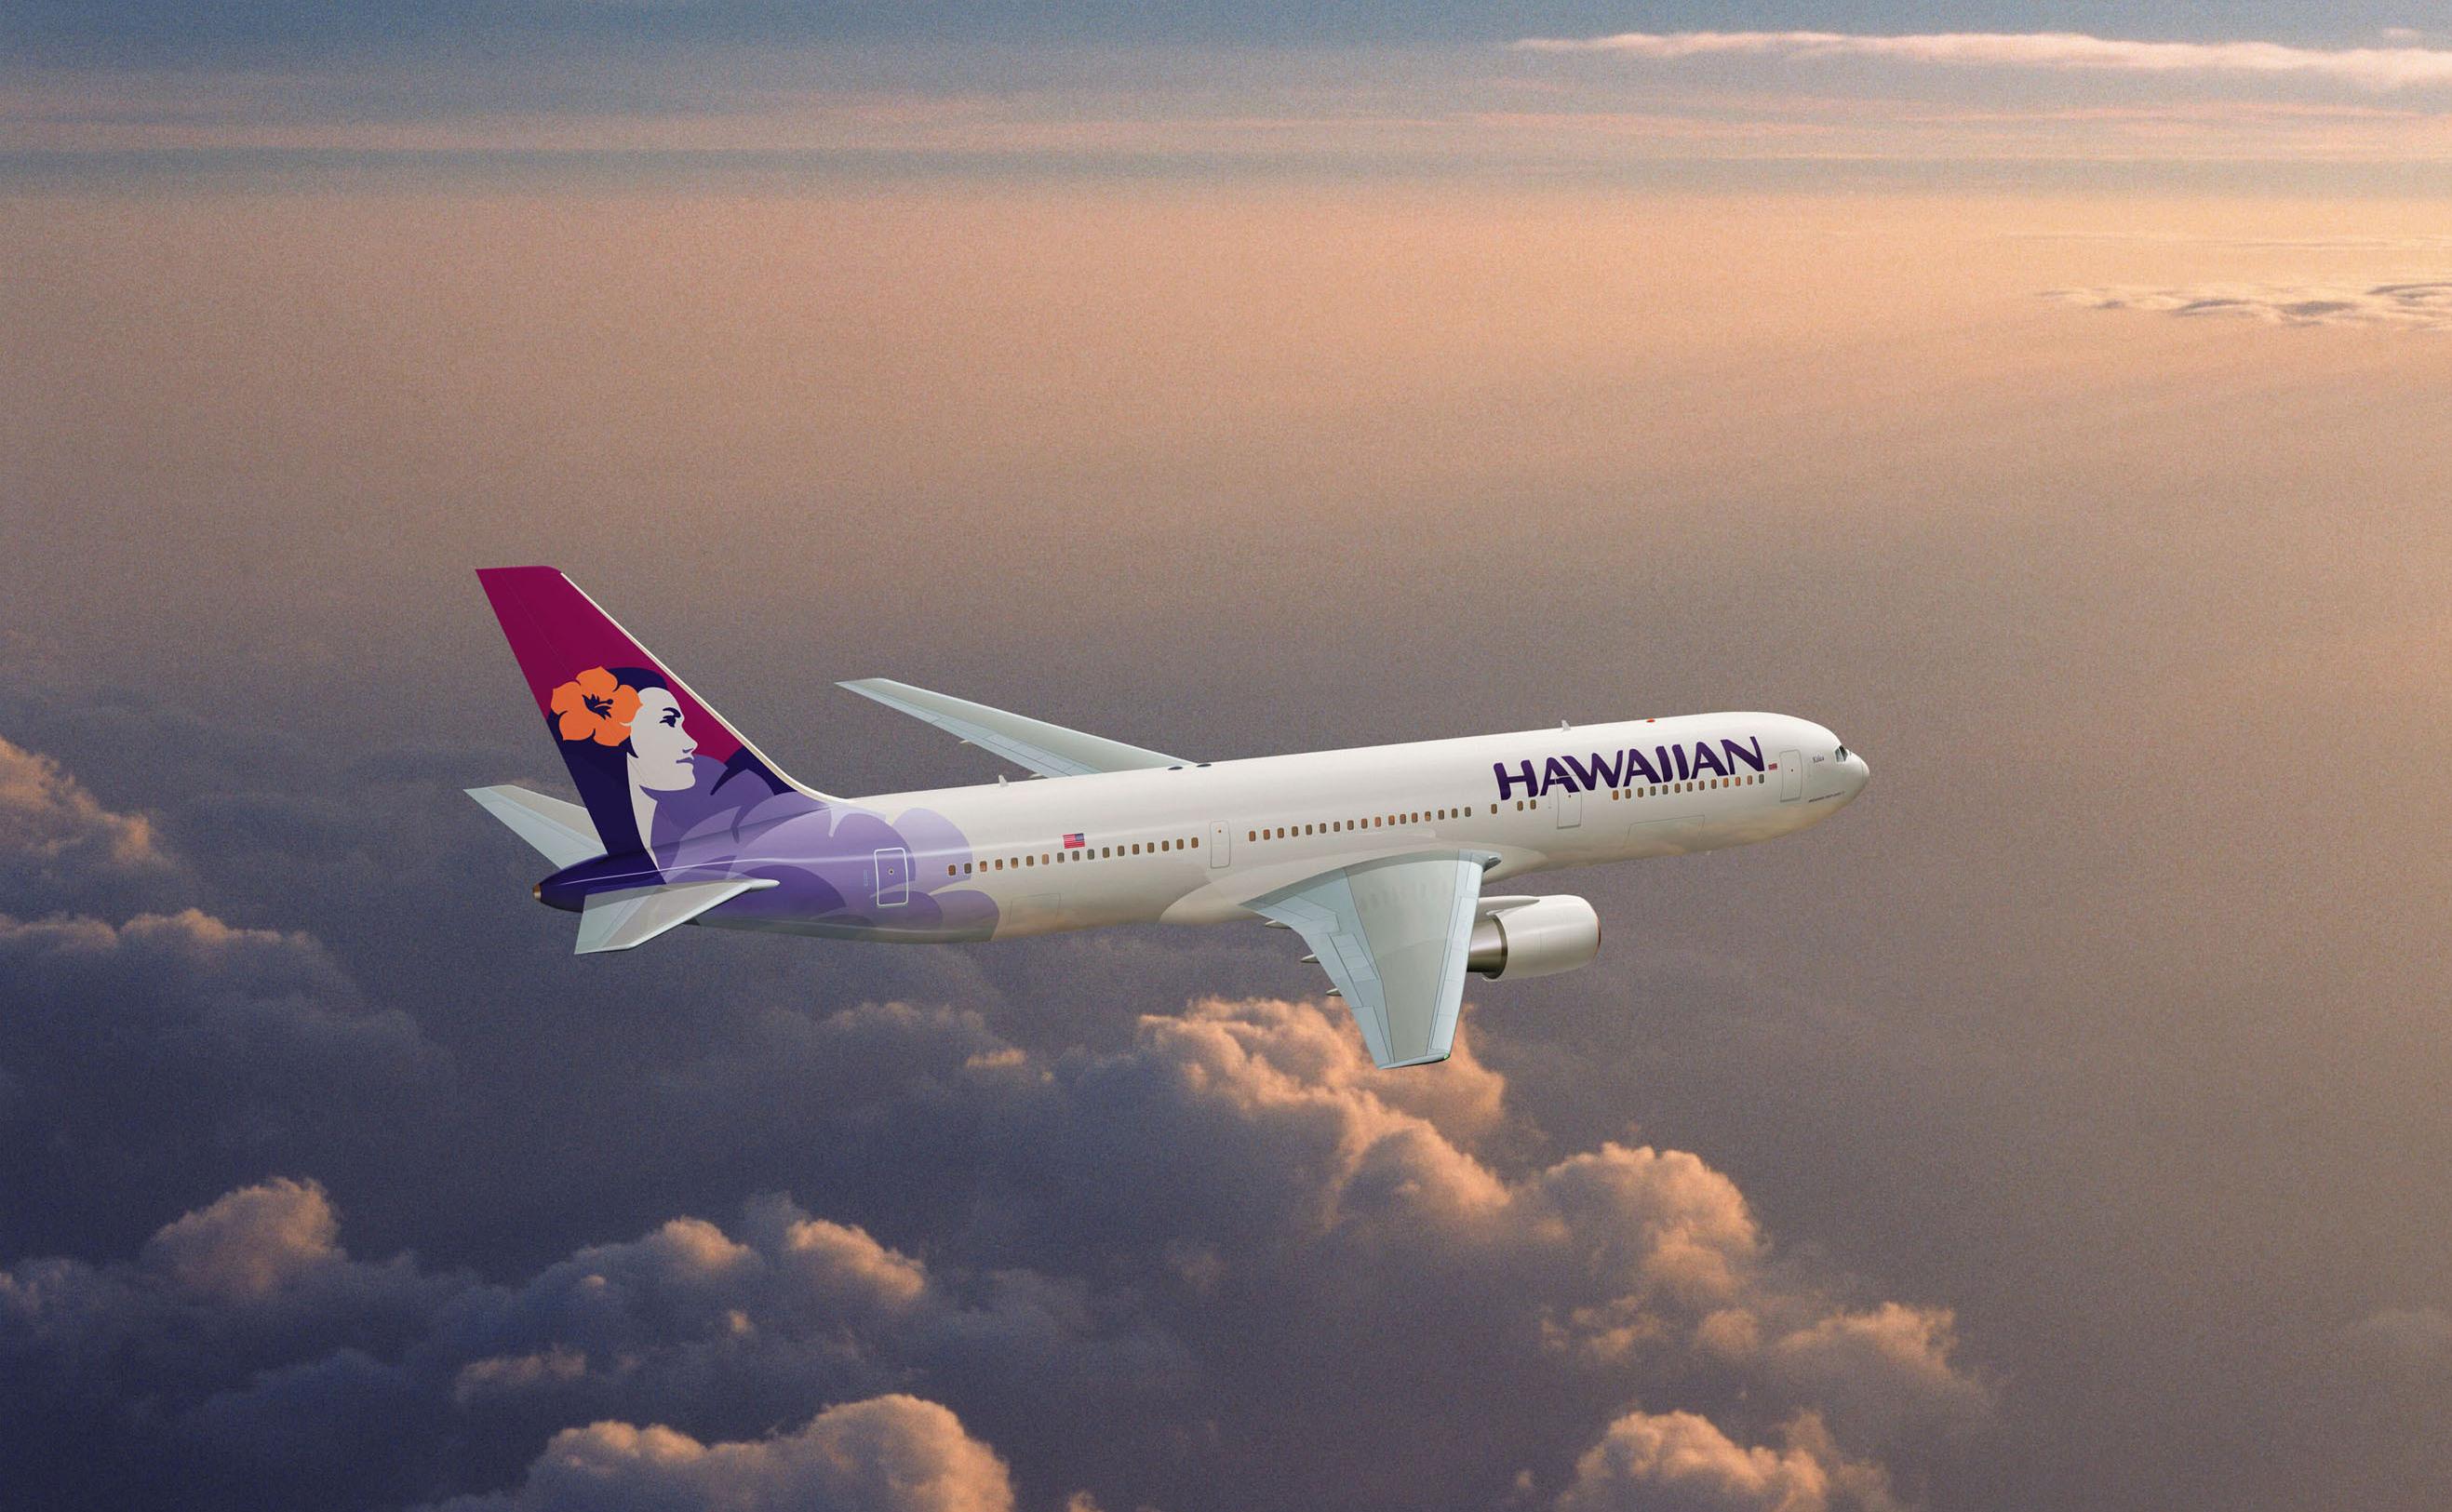 Teen Survives Flight To Hawaii In Jet's Wheel Well, FBI Says